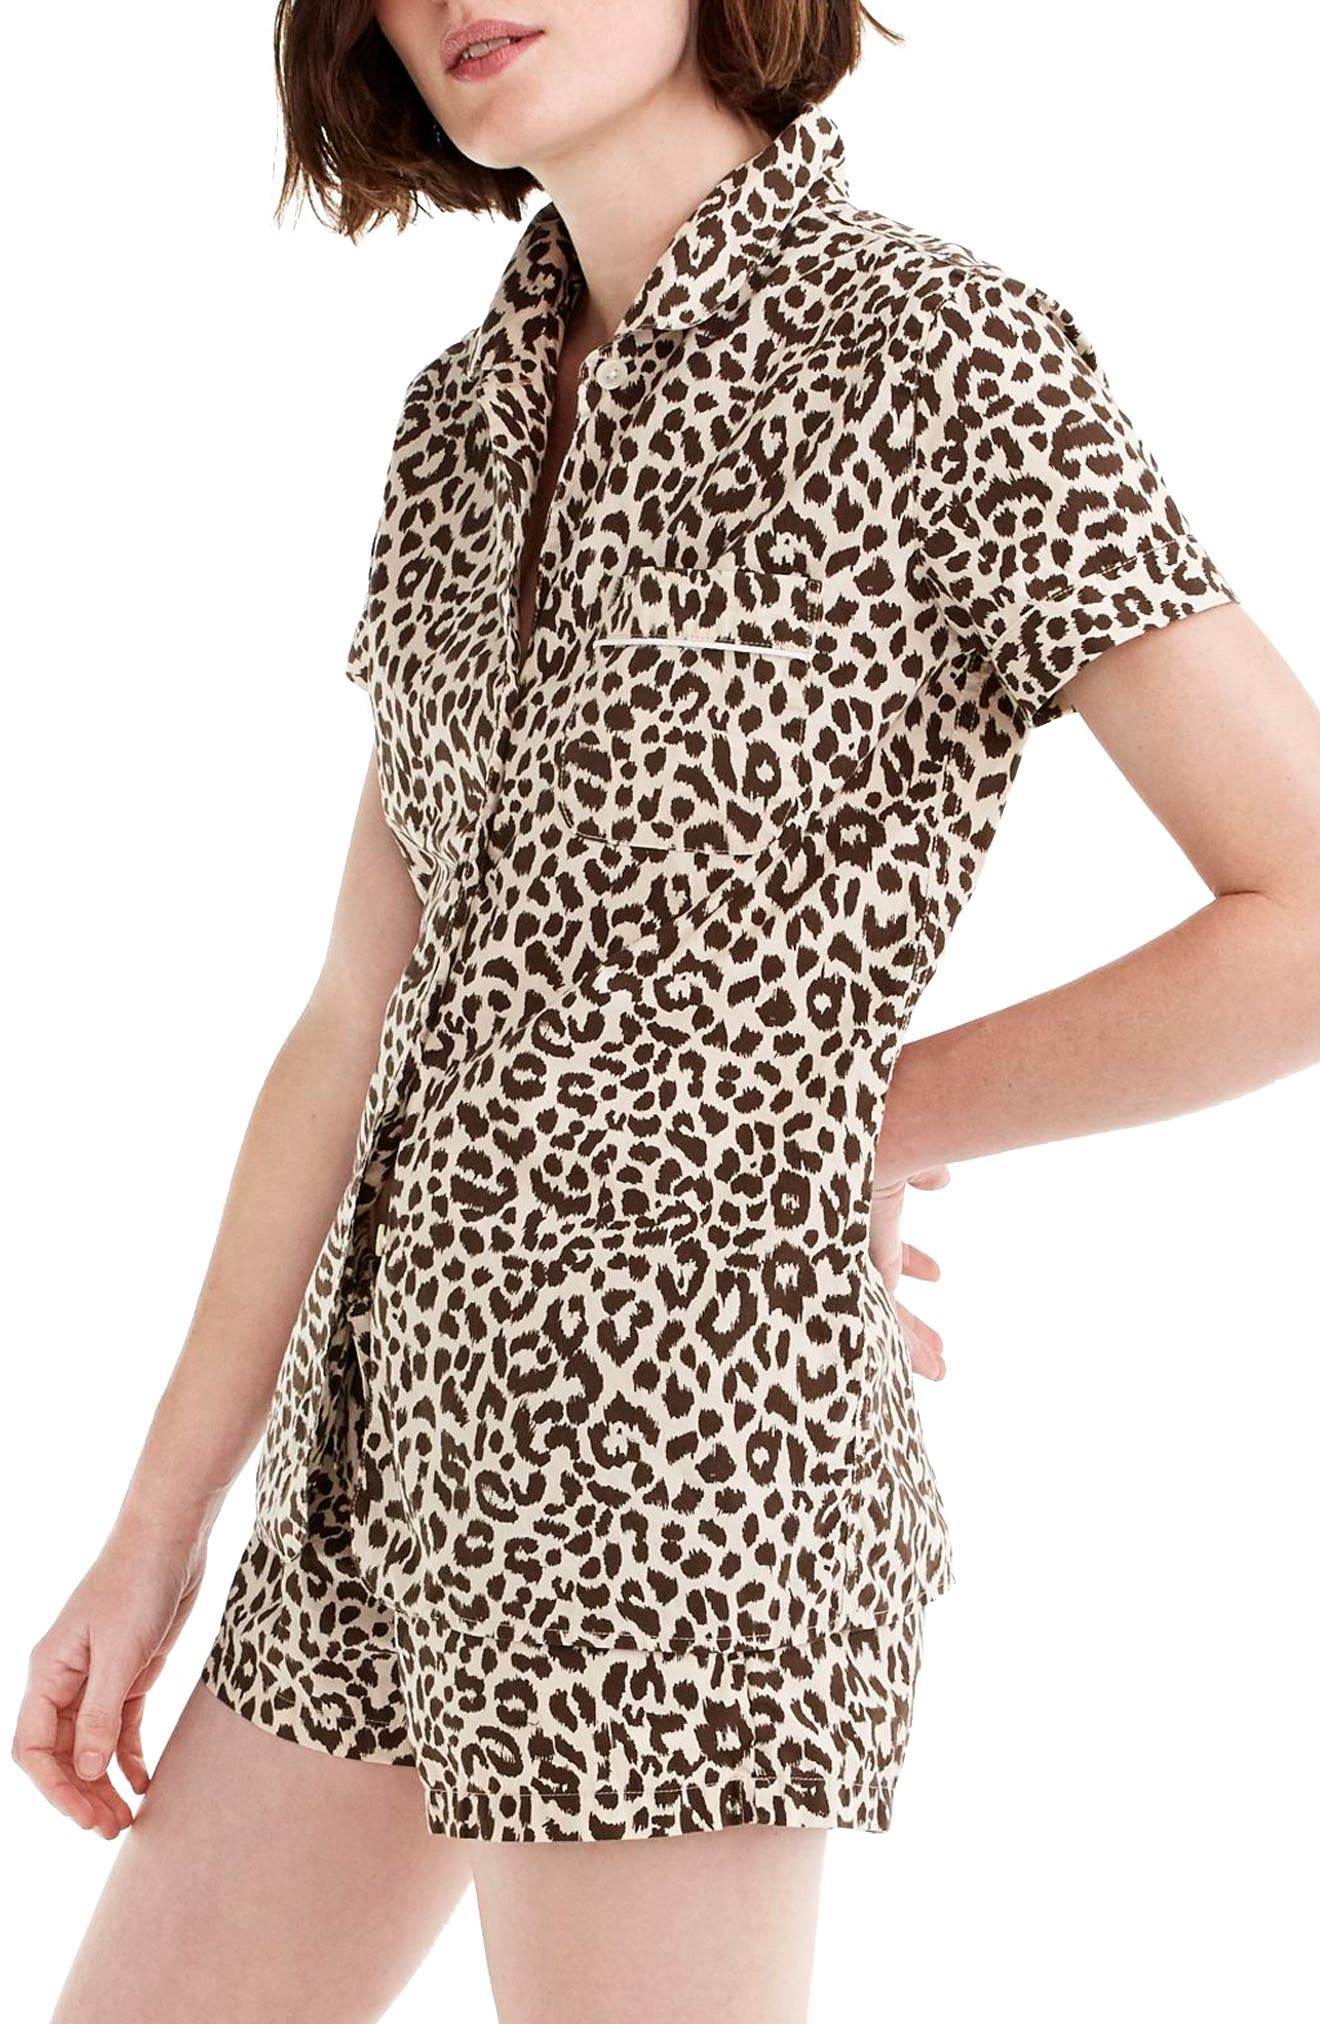 Leopard Print Cotton Pajamas,                             Main thumbnail 1, color,                             MULTI